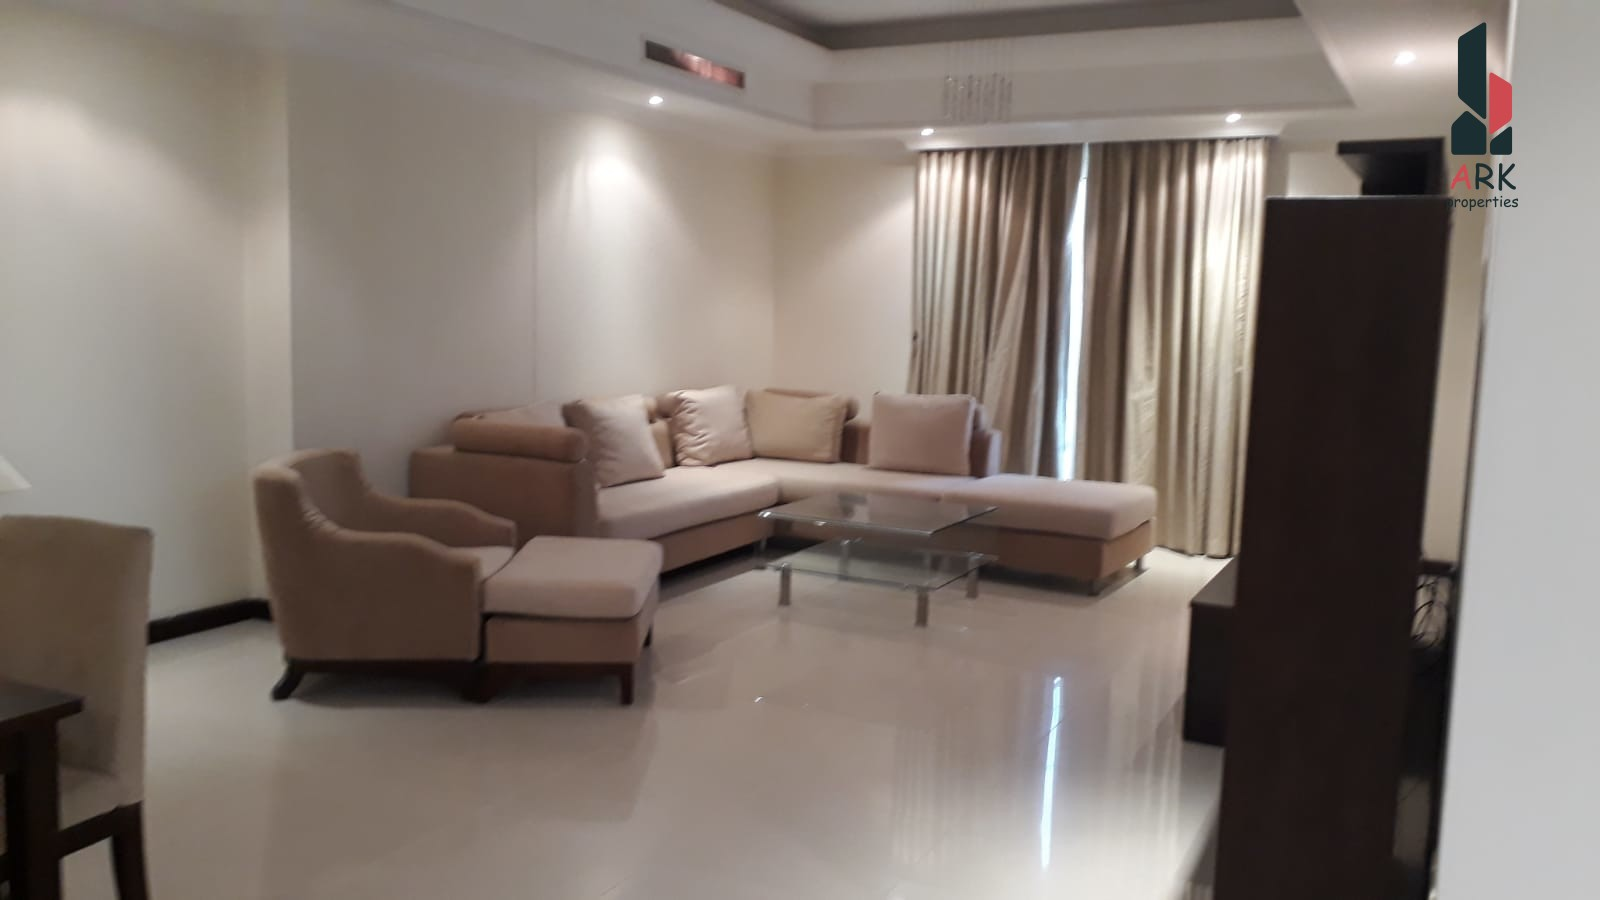 Very Spacious, bright and elegant apartment